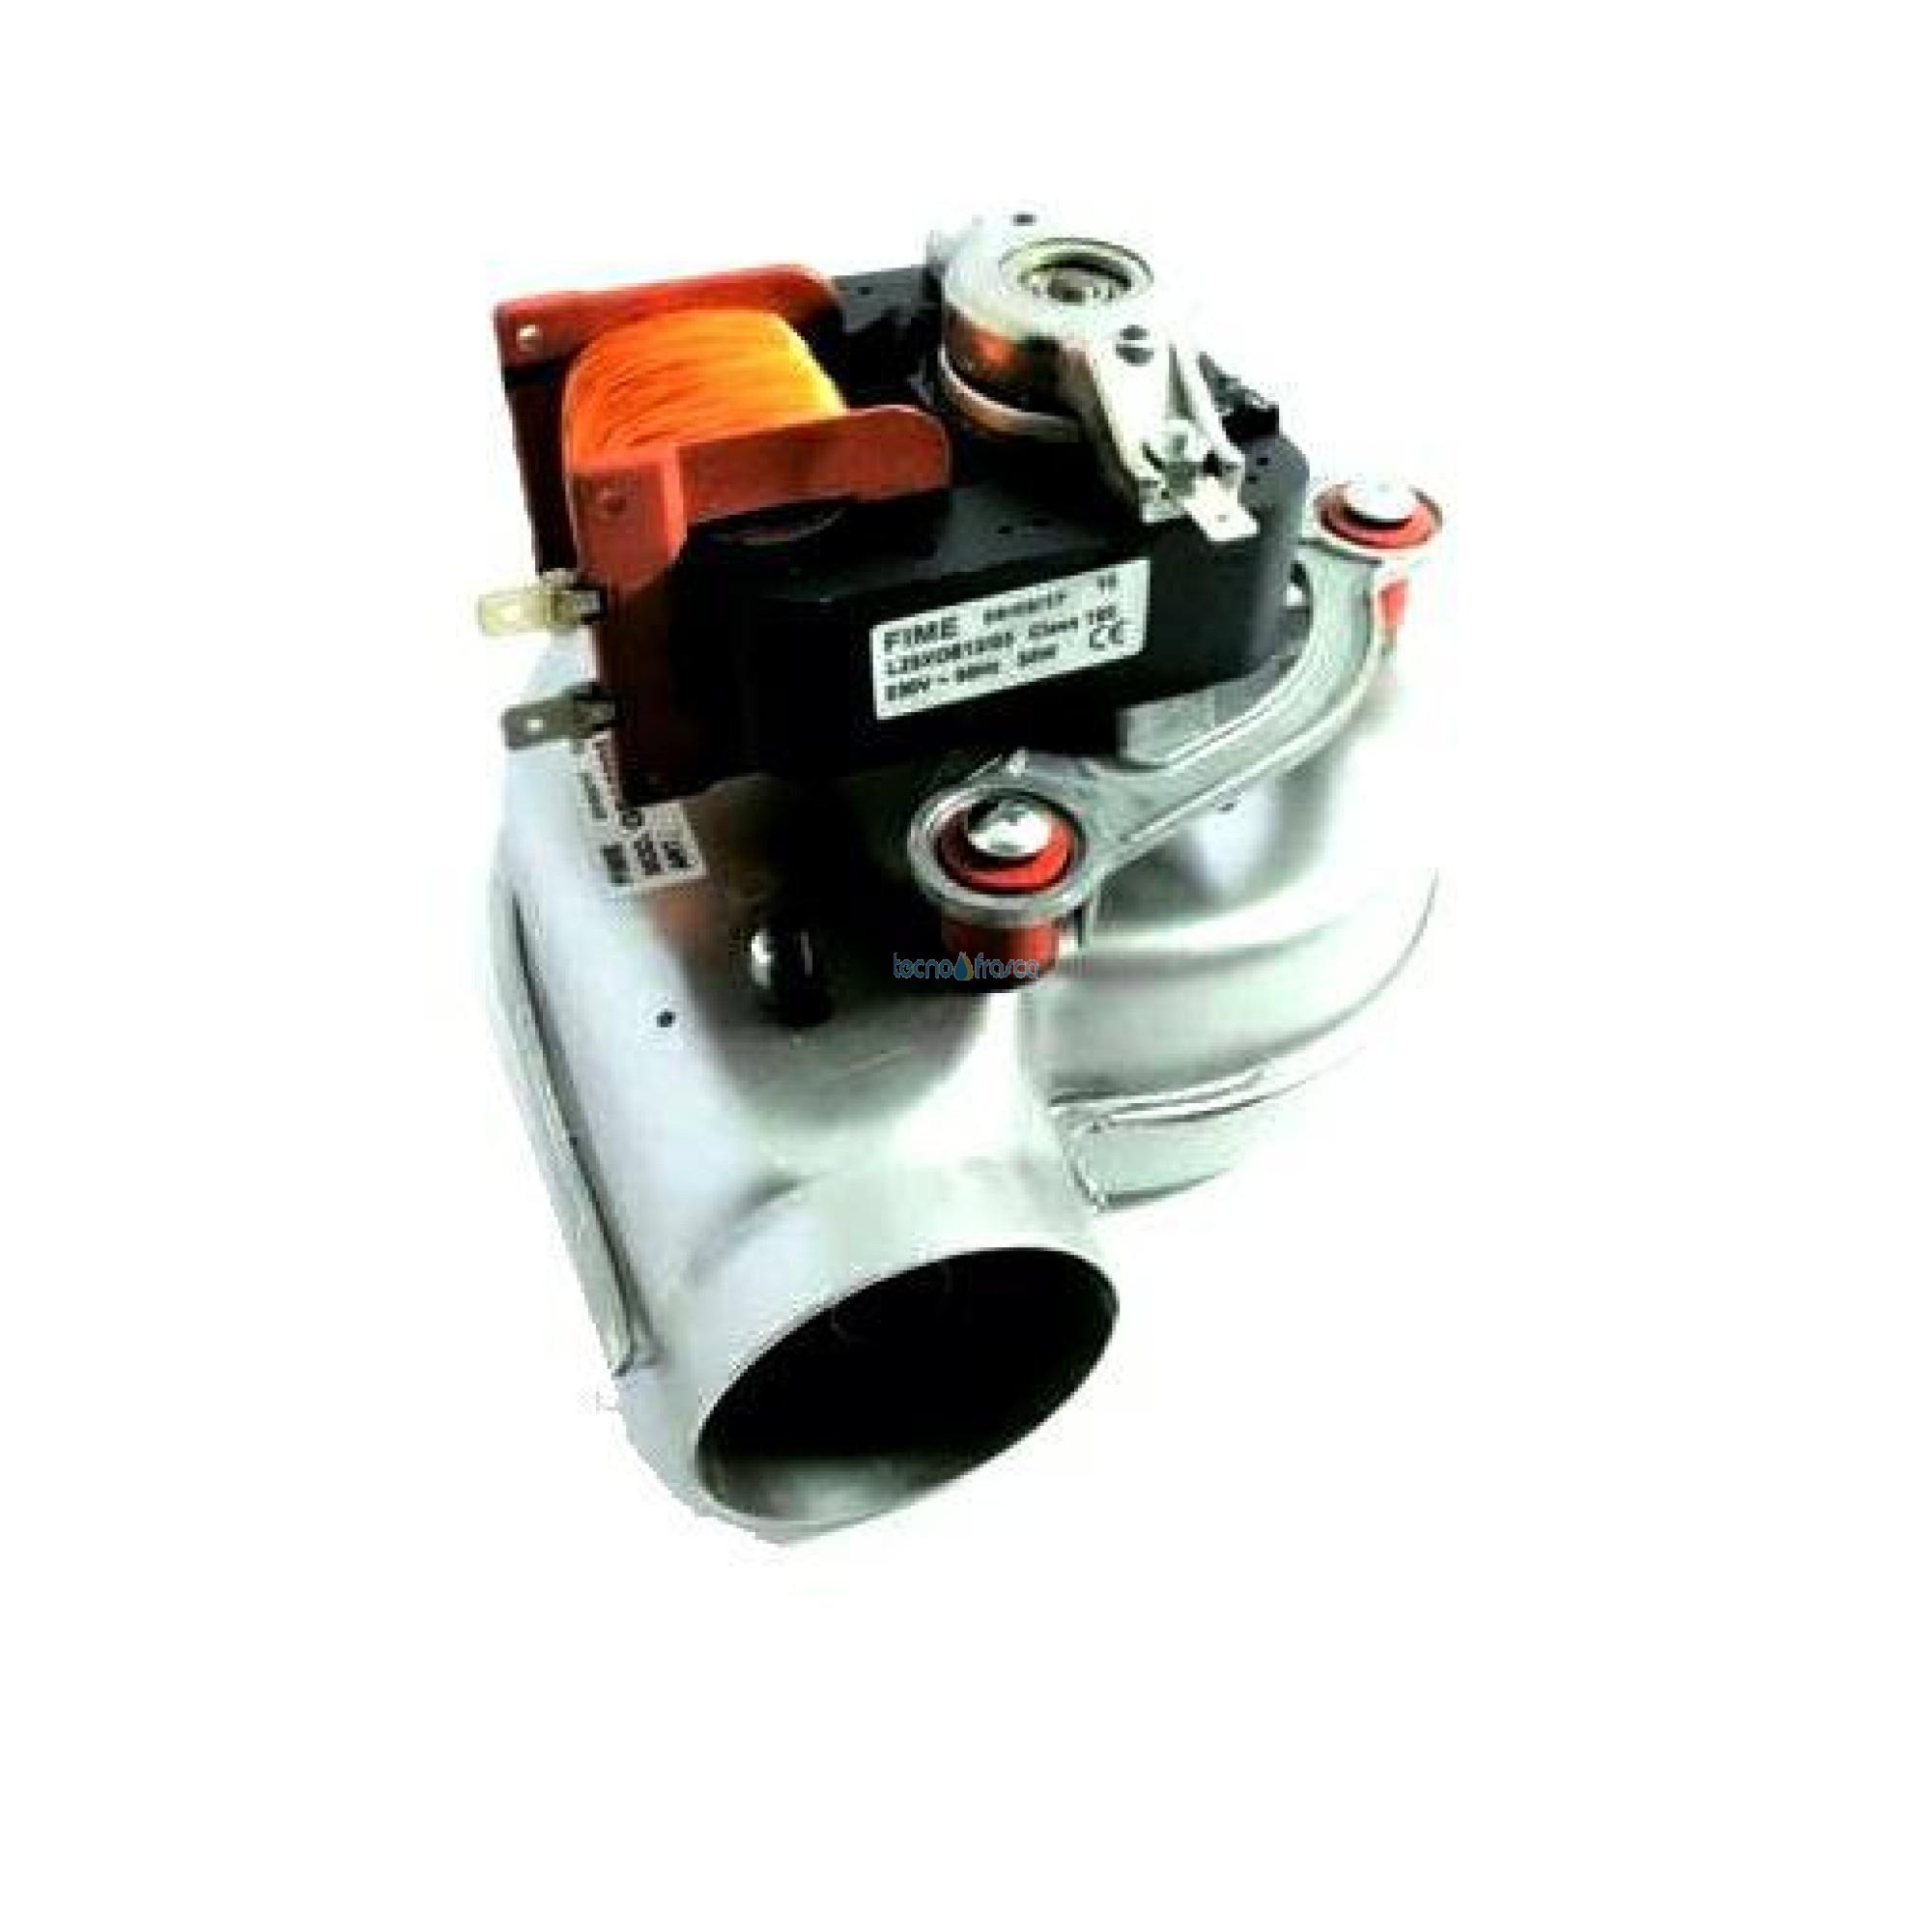 Radiant elettroventilatore ngr/rsr24-gr03905 50-00011